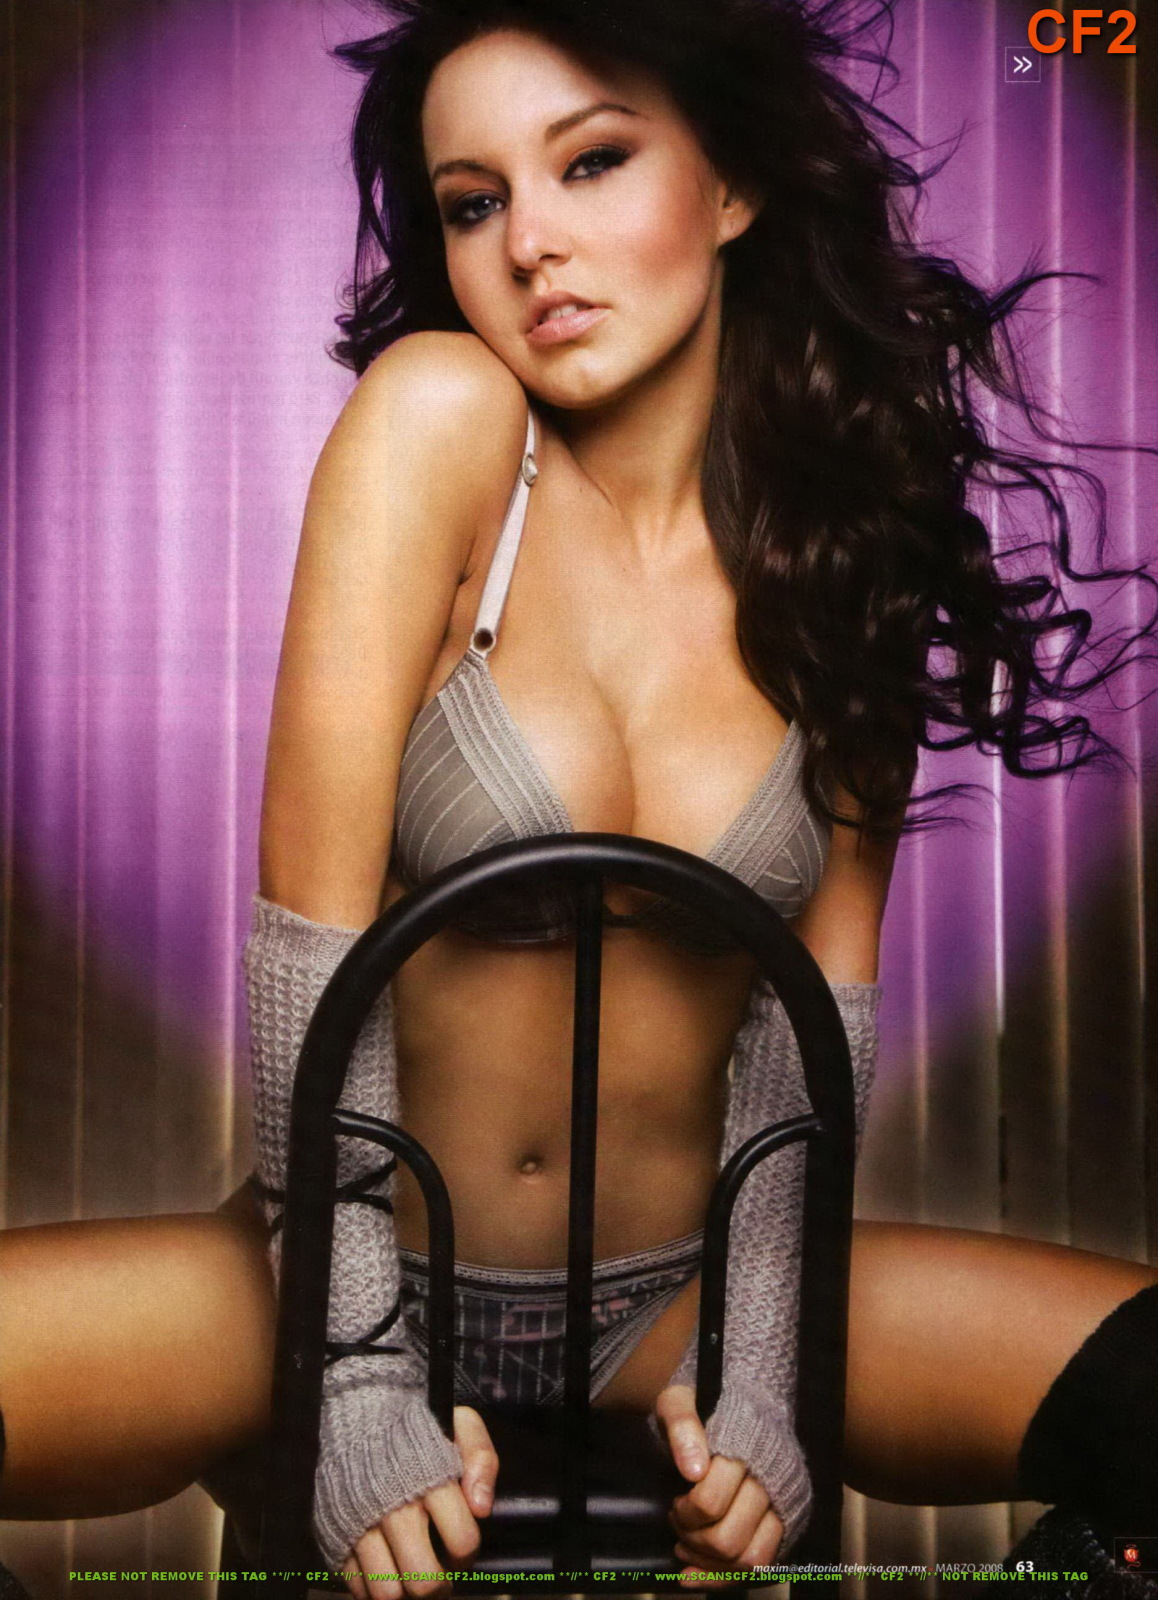 Angelique Boyer Fotos Porno showing xxx images for teresa angelique boyer xxx | www